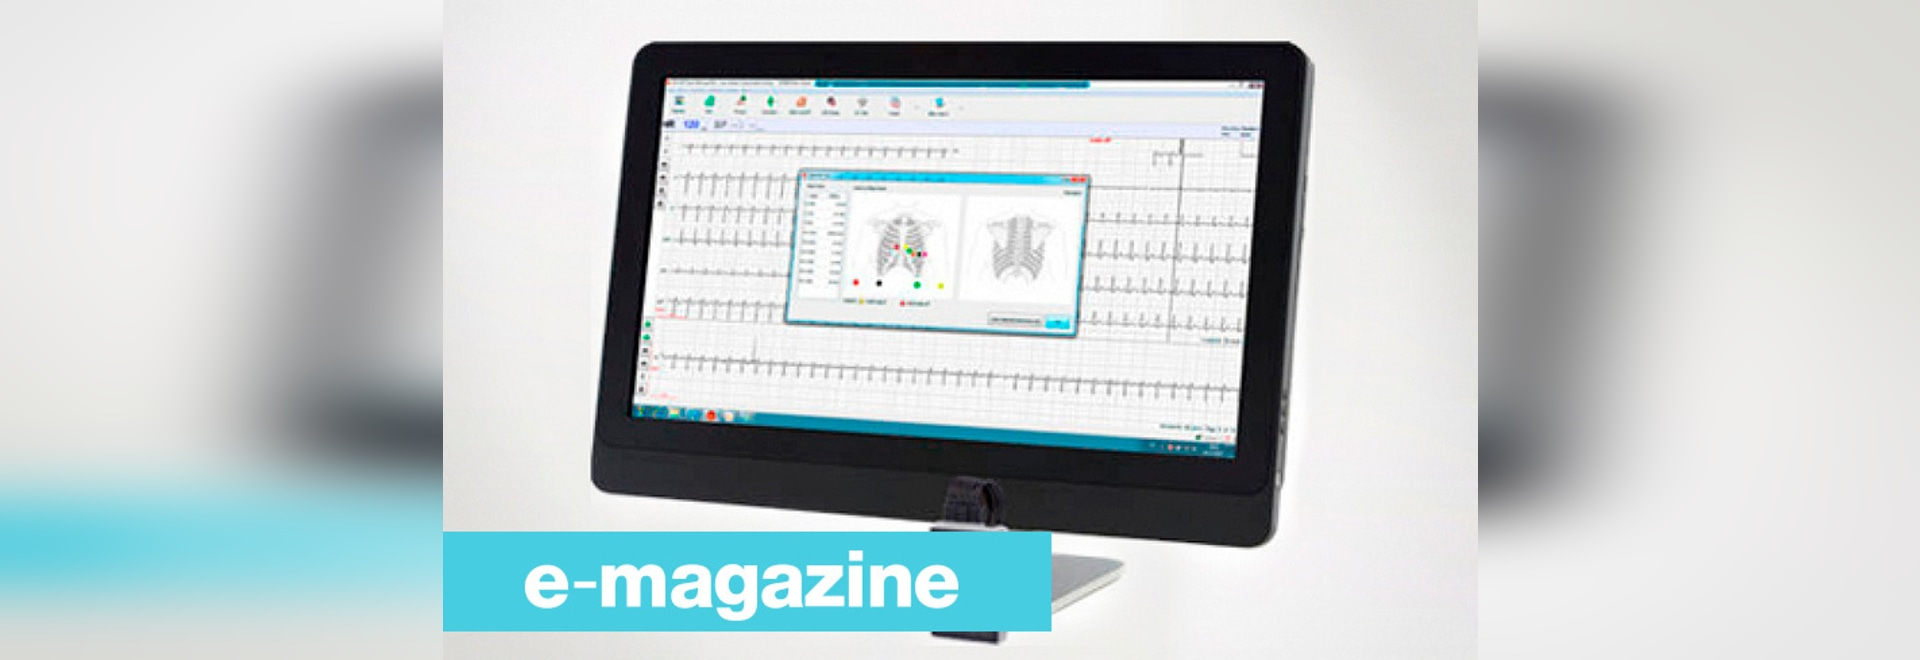 Un nuevo sistema de ECG para detectar anormalidades cardiacas